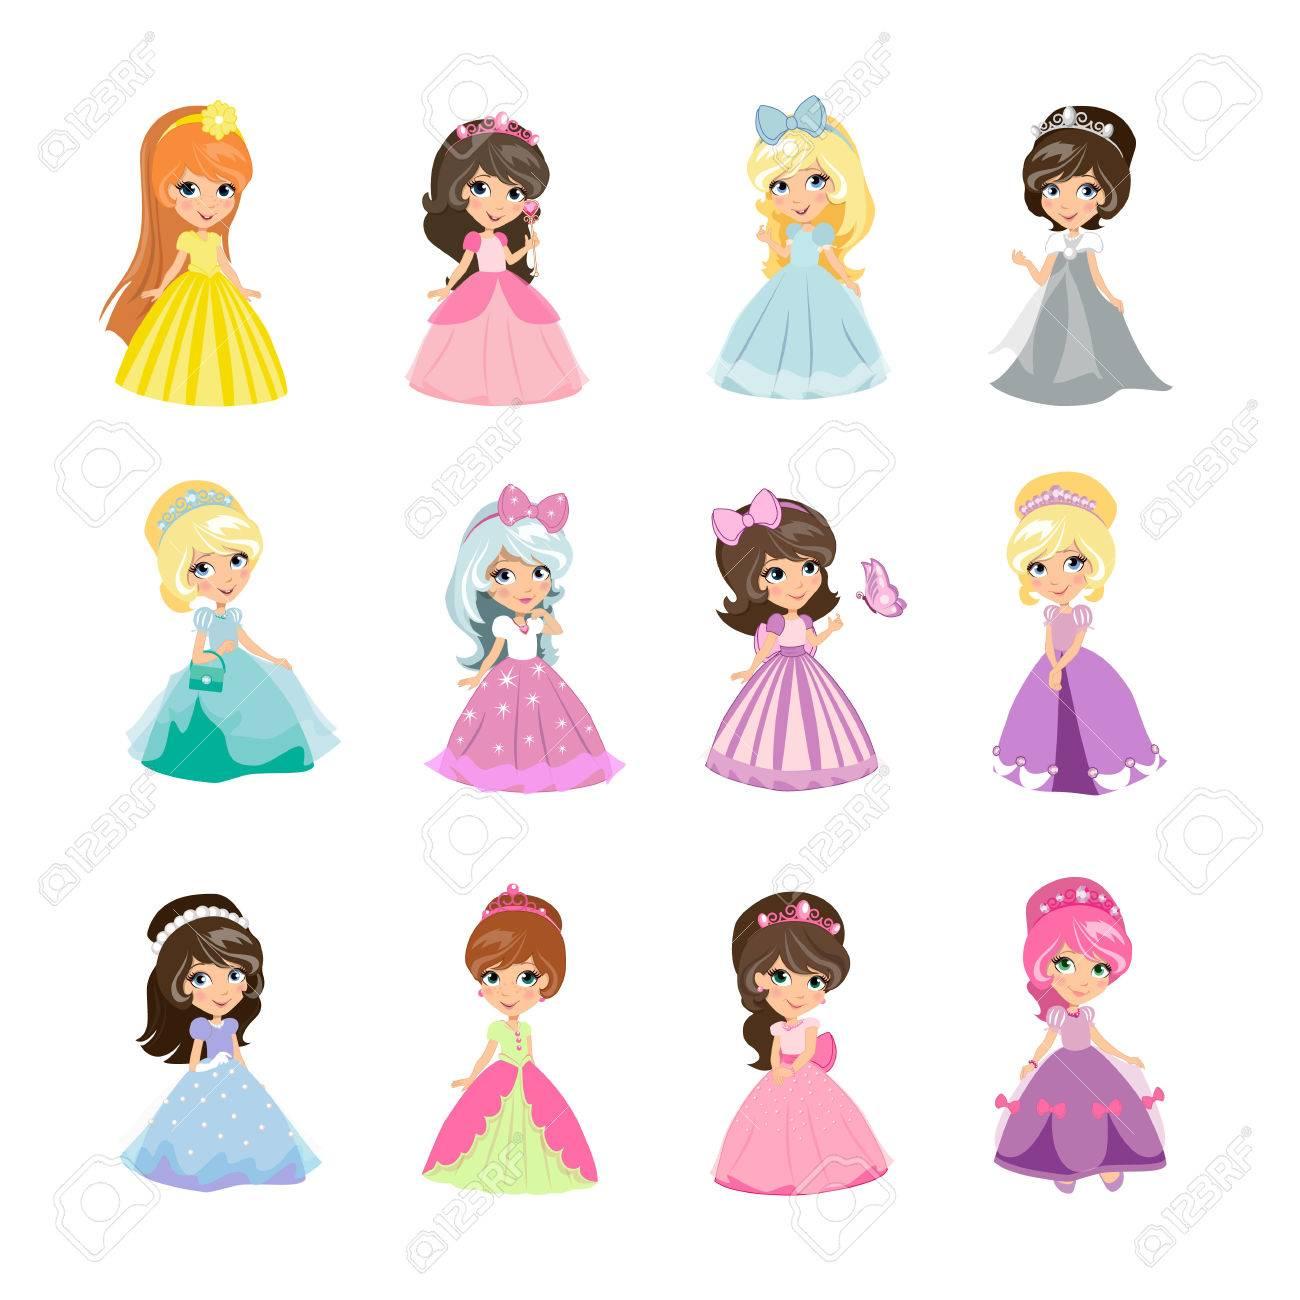 Mode Avondjurken.Set Van Prinsessen In Avondjurken Geisoleerd Elegant Kleine Meisjes